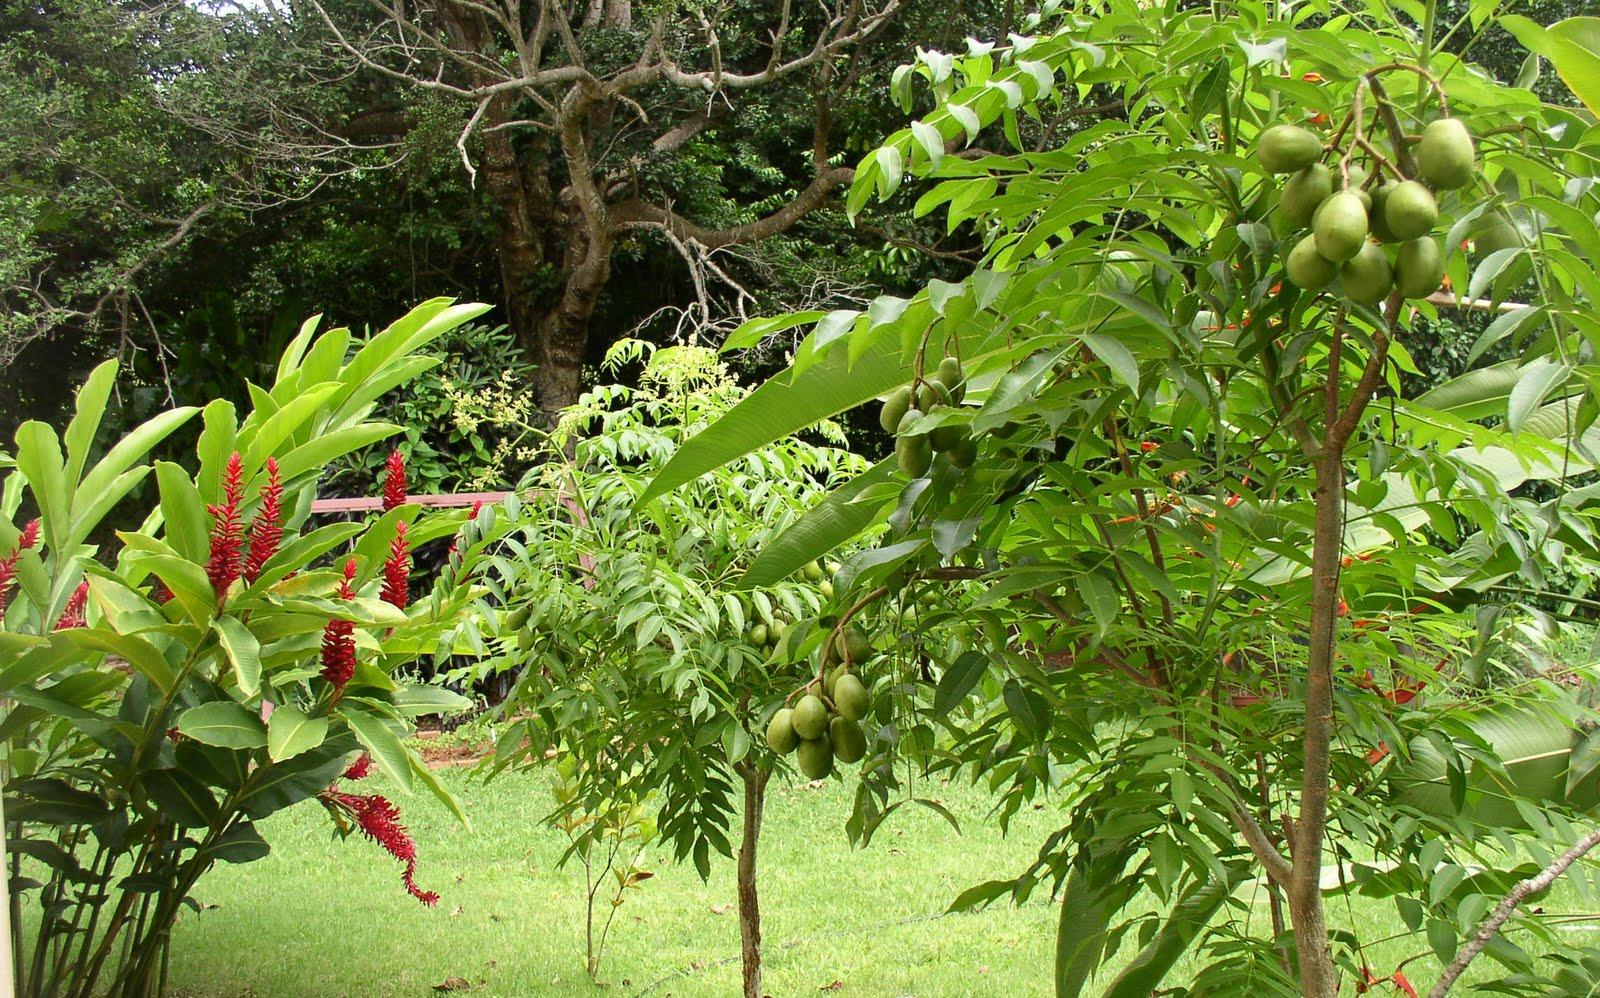 Agrochic gardening inspiration advice rboles frutales for Arboles enanos para jardin